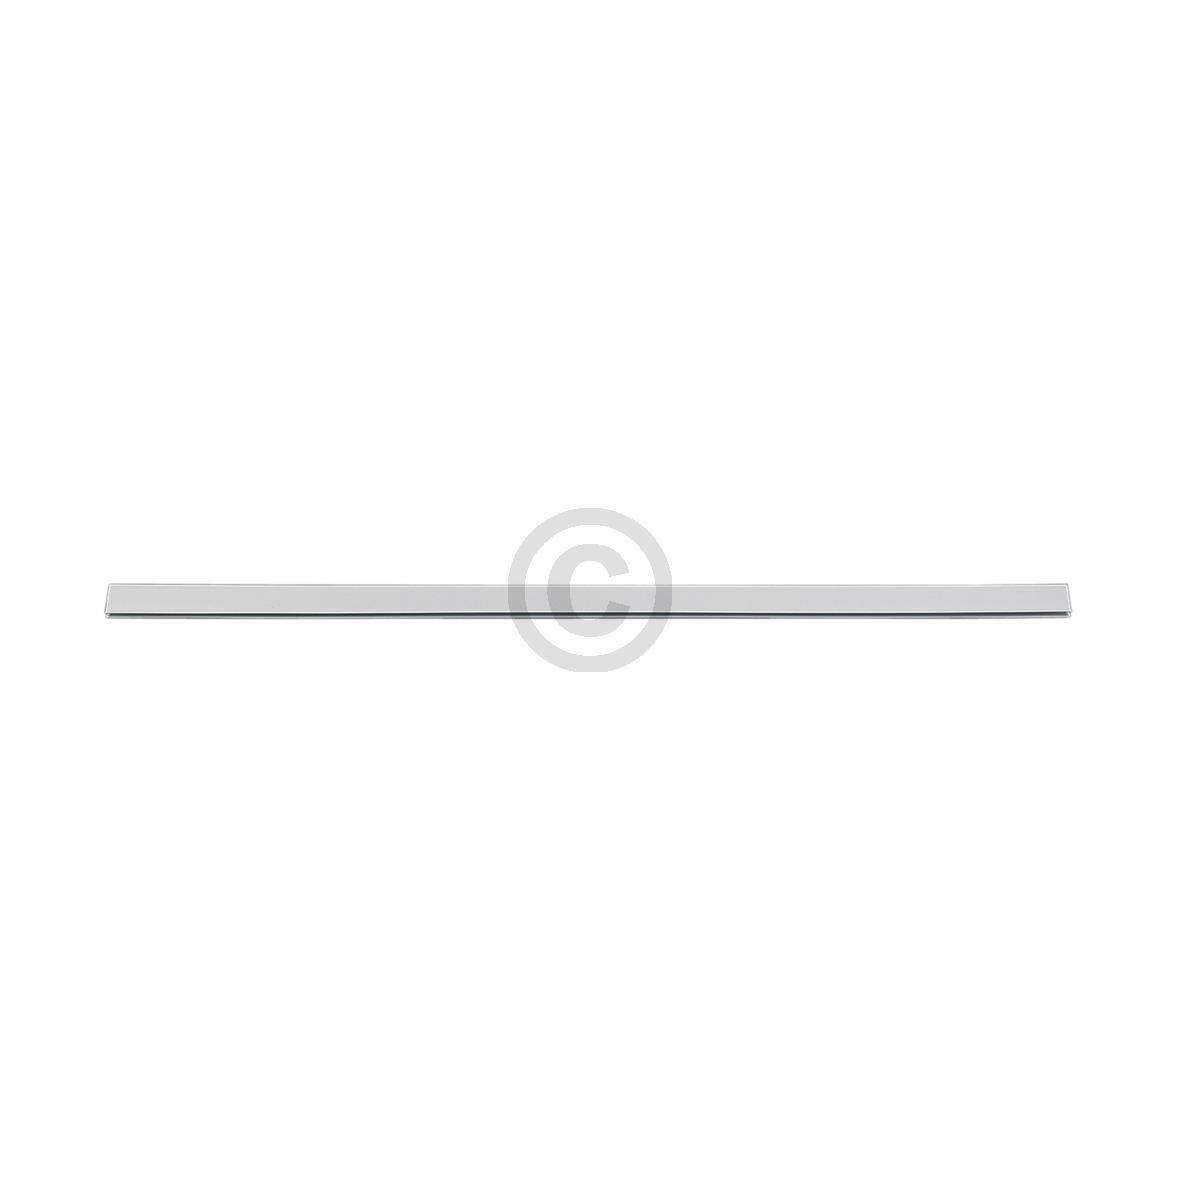 Glasplattenleiste vorne 234280772 AEG, Electrolux, Juno, Zanussi